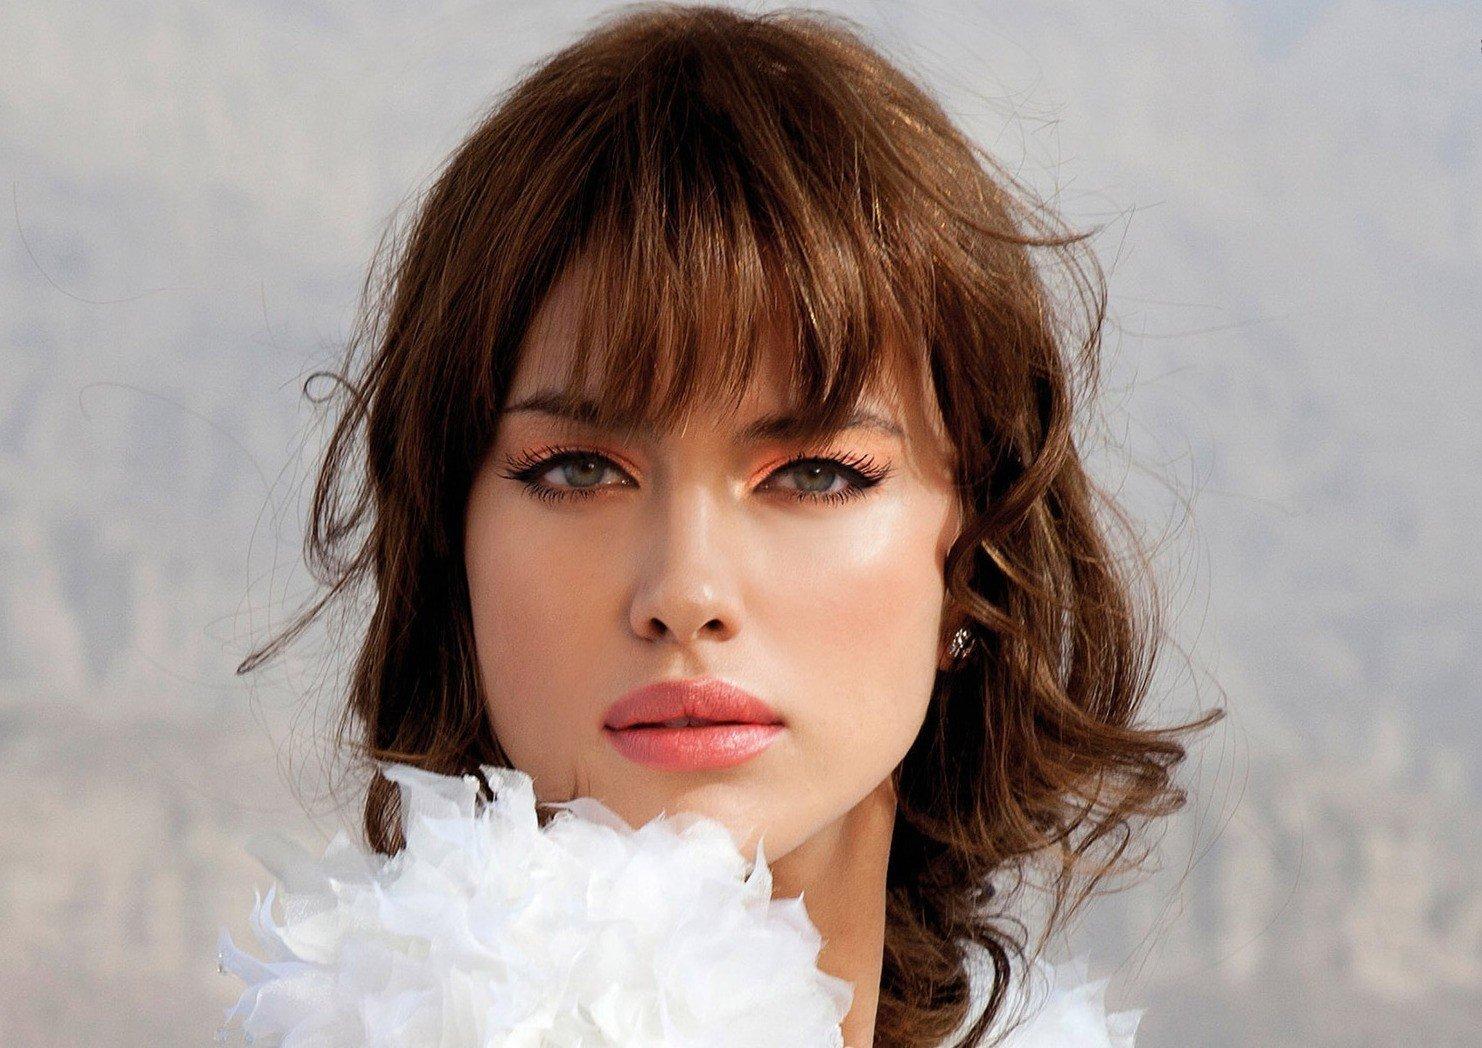 Irina Shayk Women Model Face Brunette Hd Wallpapers